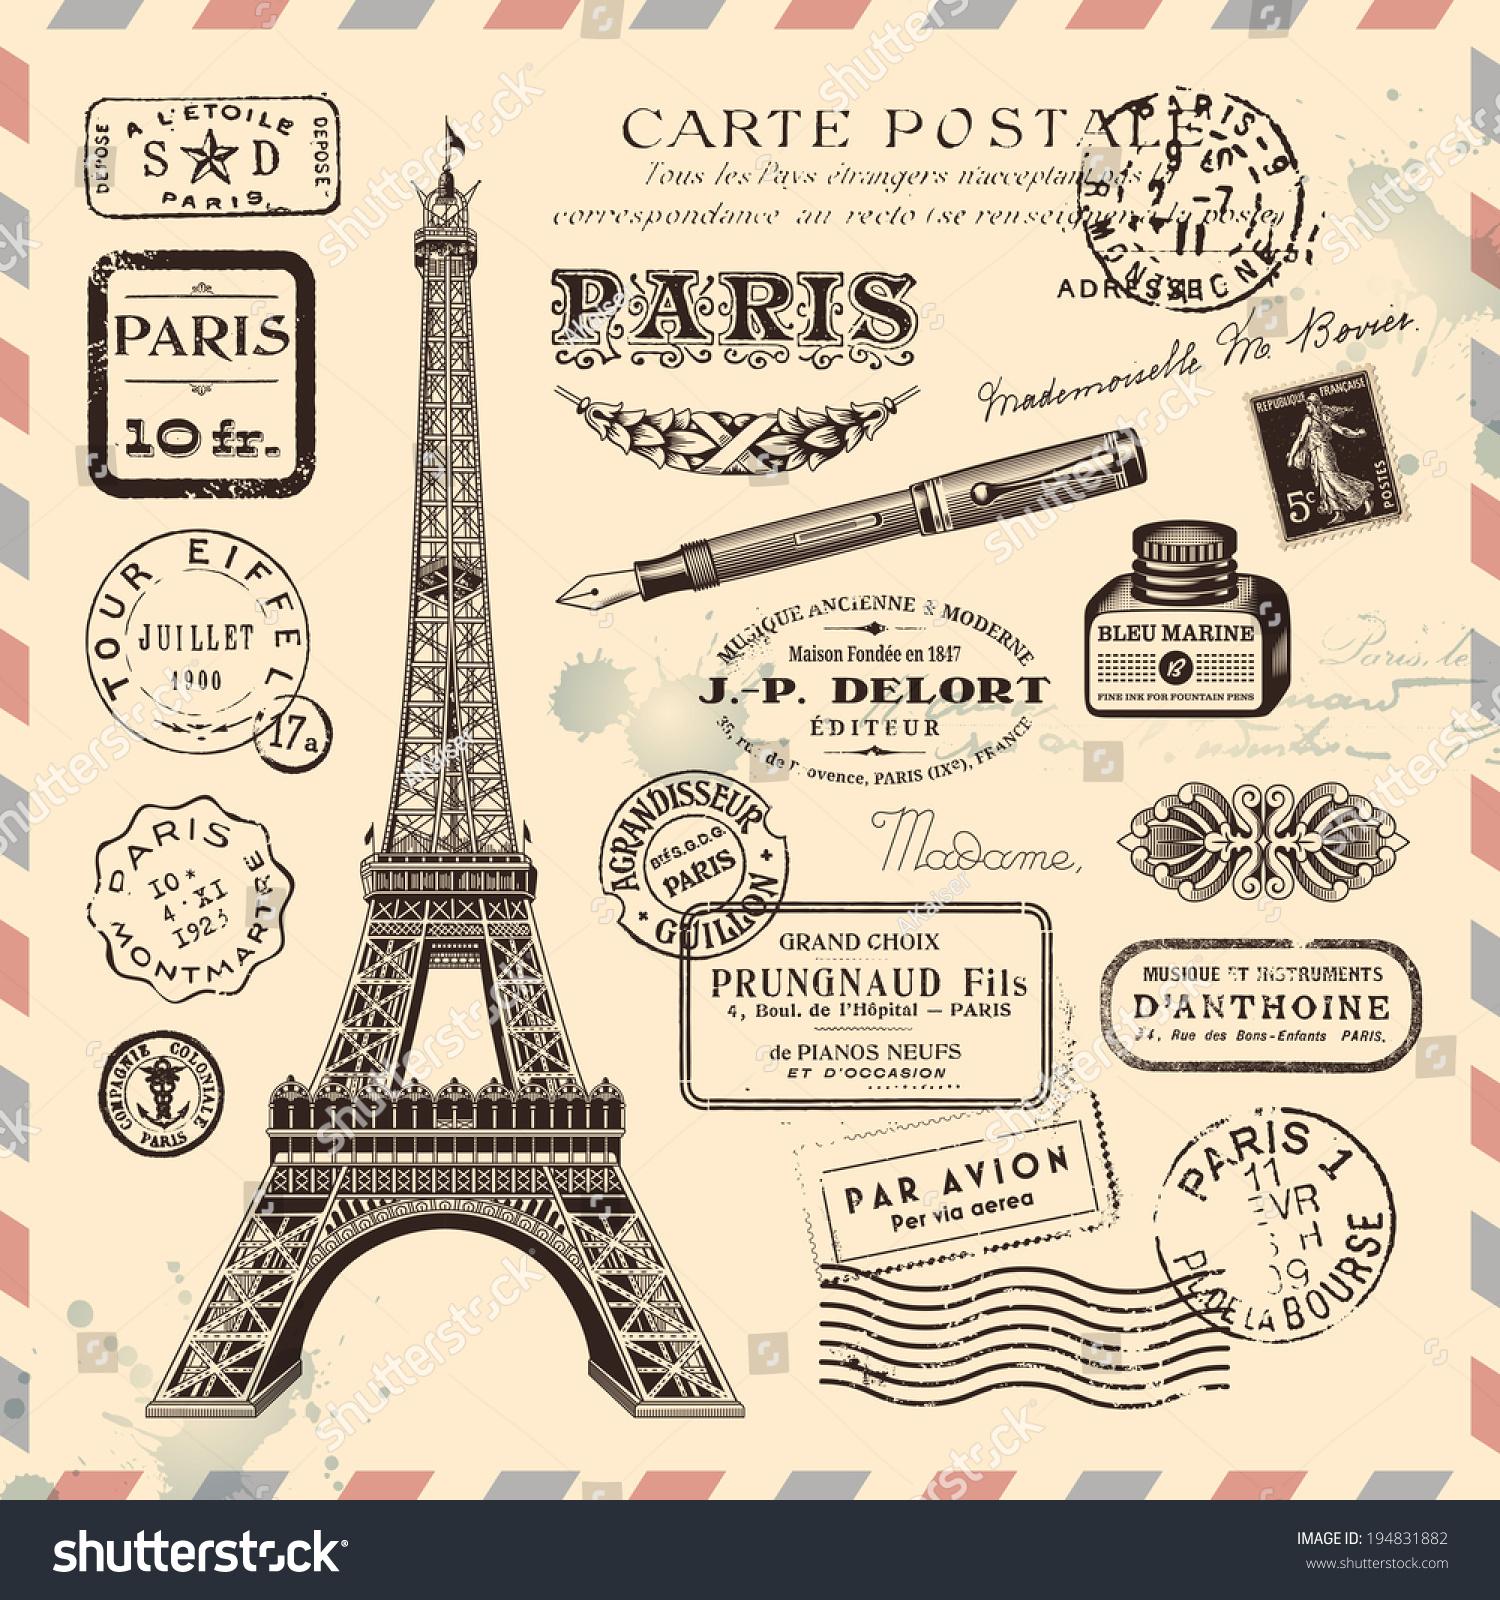 Paris postage design elements stock vector illustration for Design paris